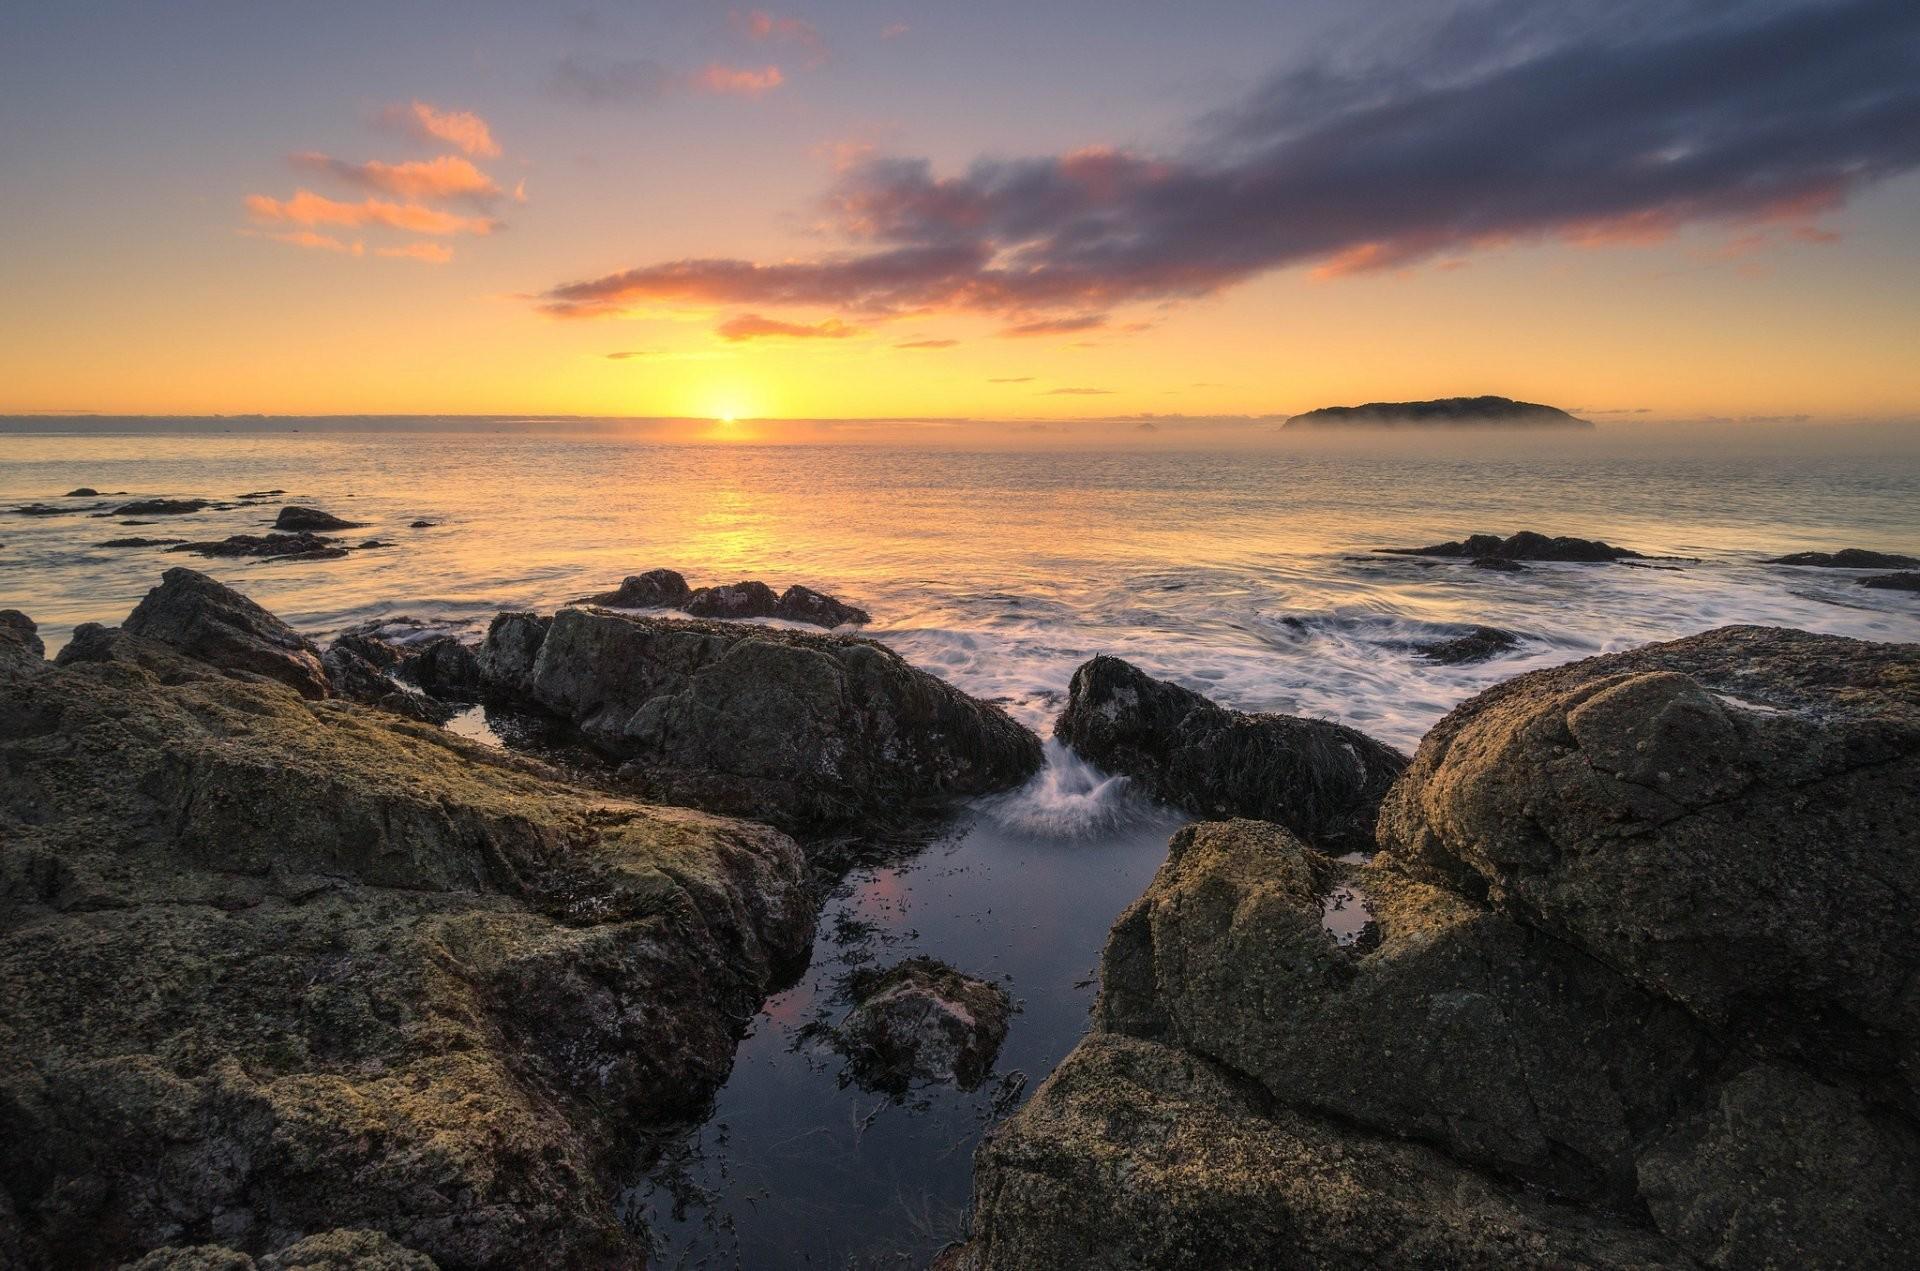 tairua waikato nz new zealand ocean morning dawn horizon sun stones